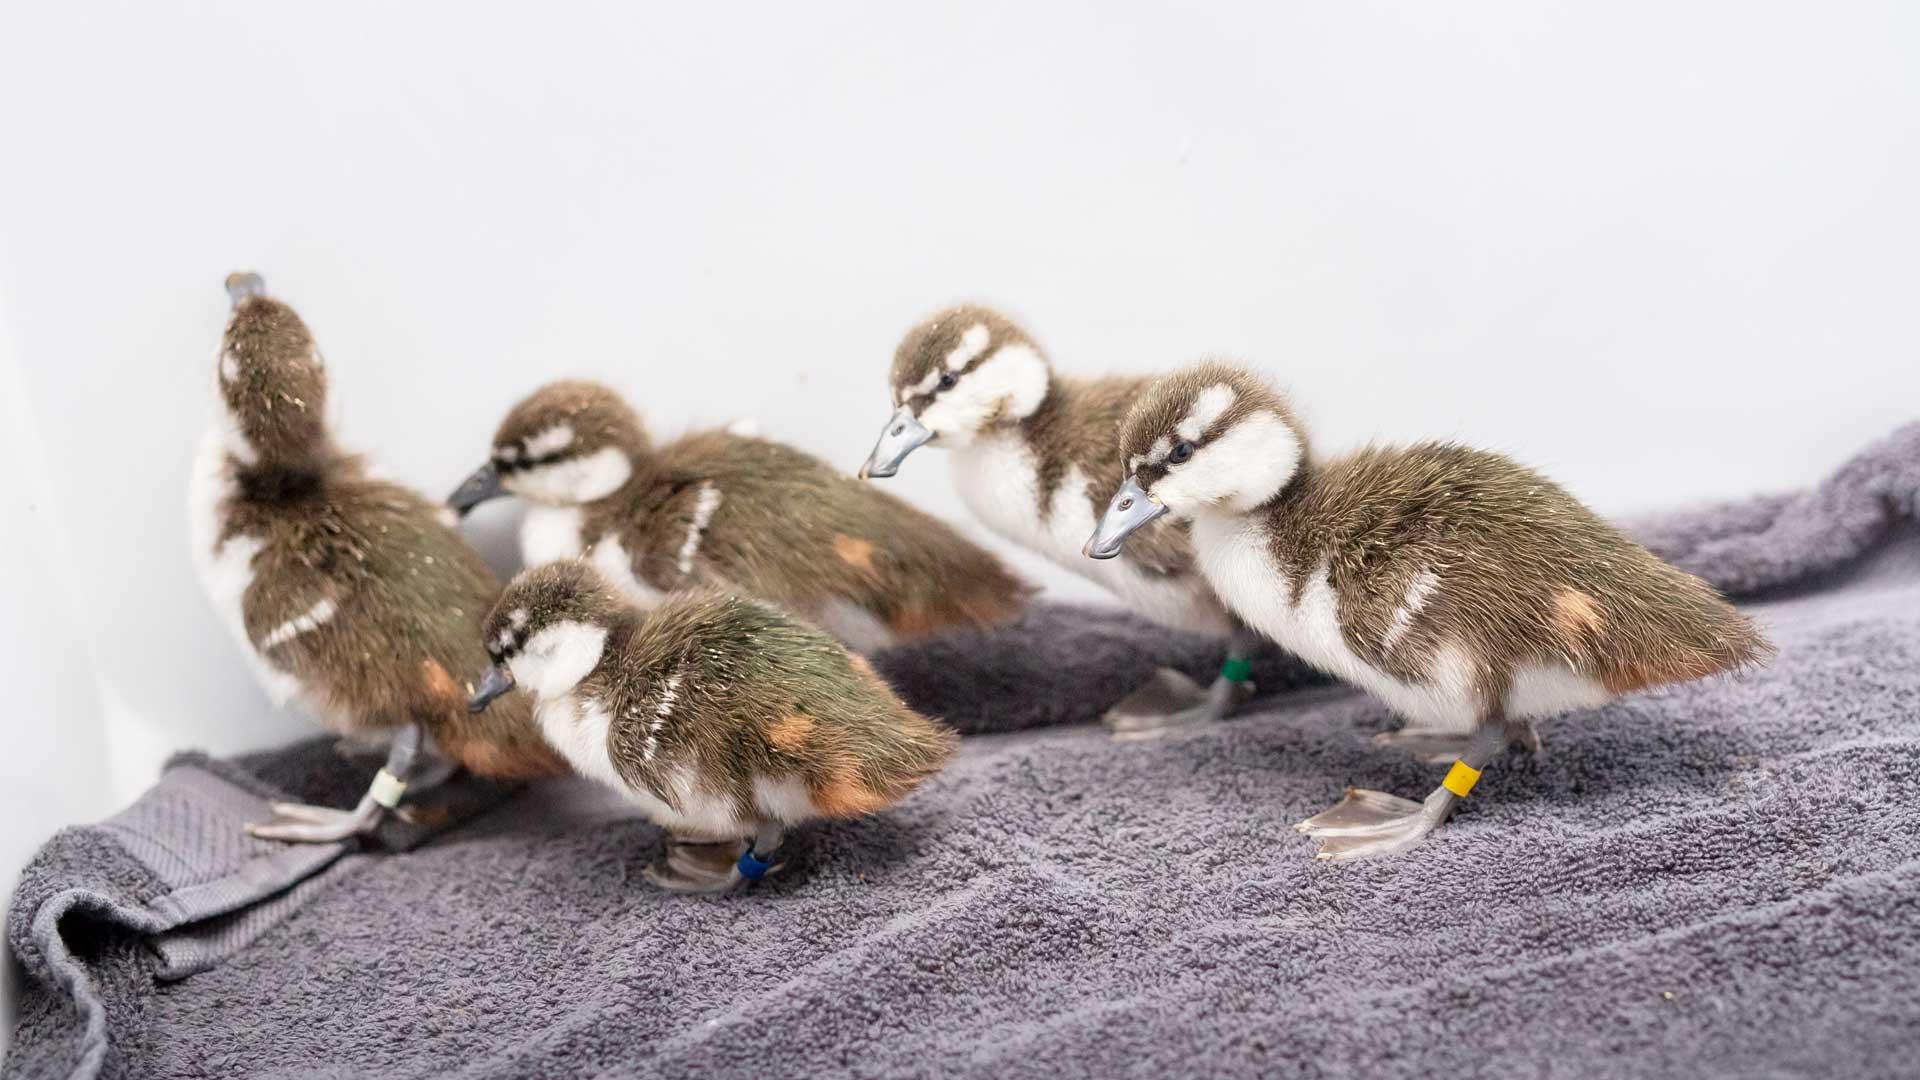 https://rfacdn.nz/zoo/assets/media/whio-duckling-gallery-8.jpg